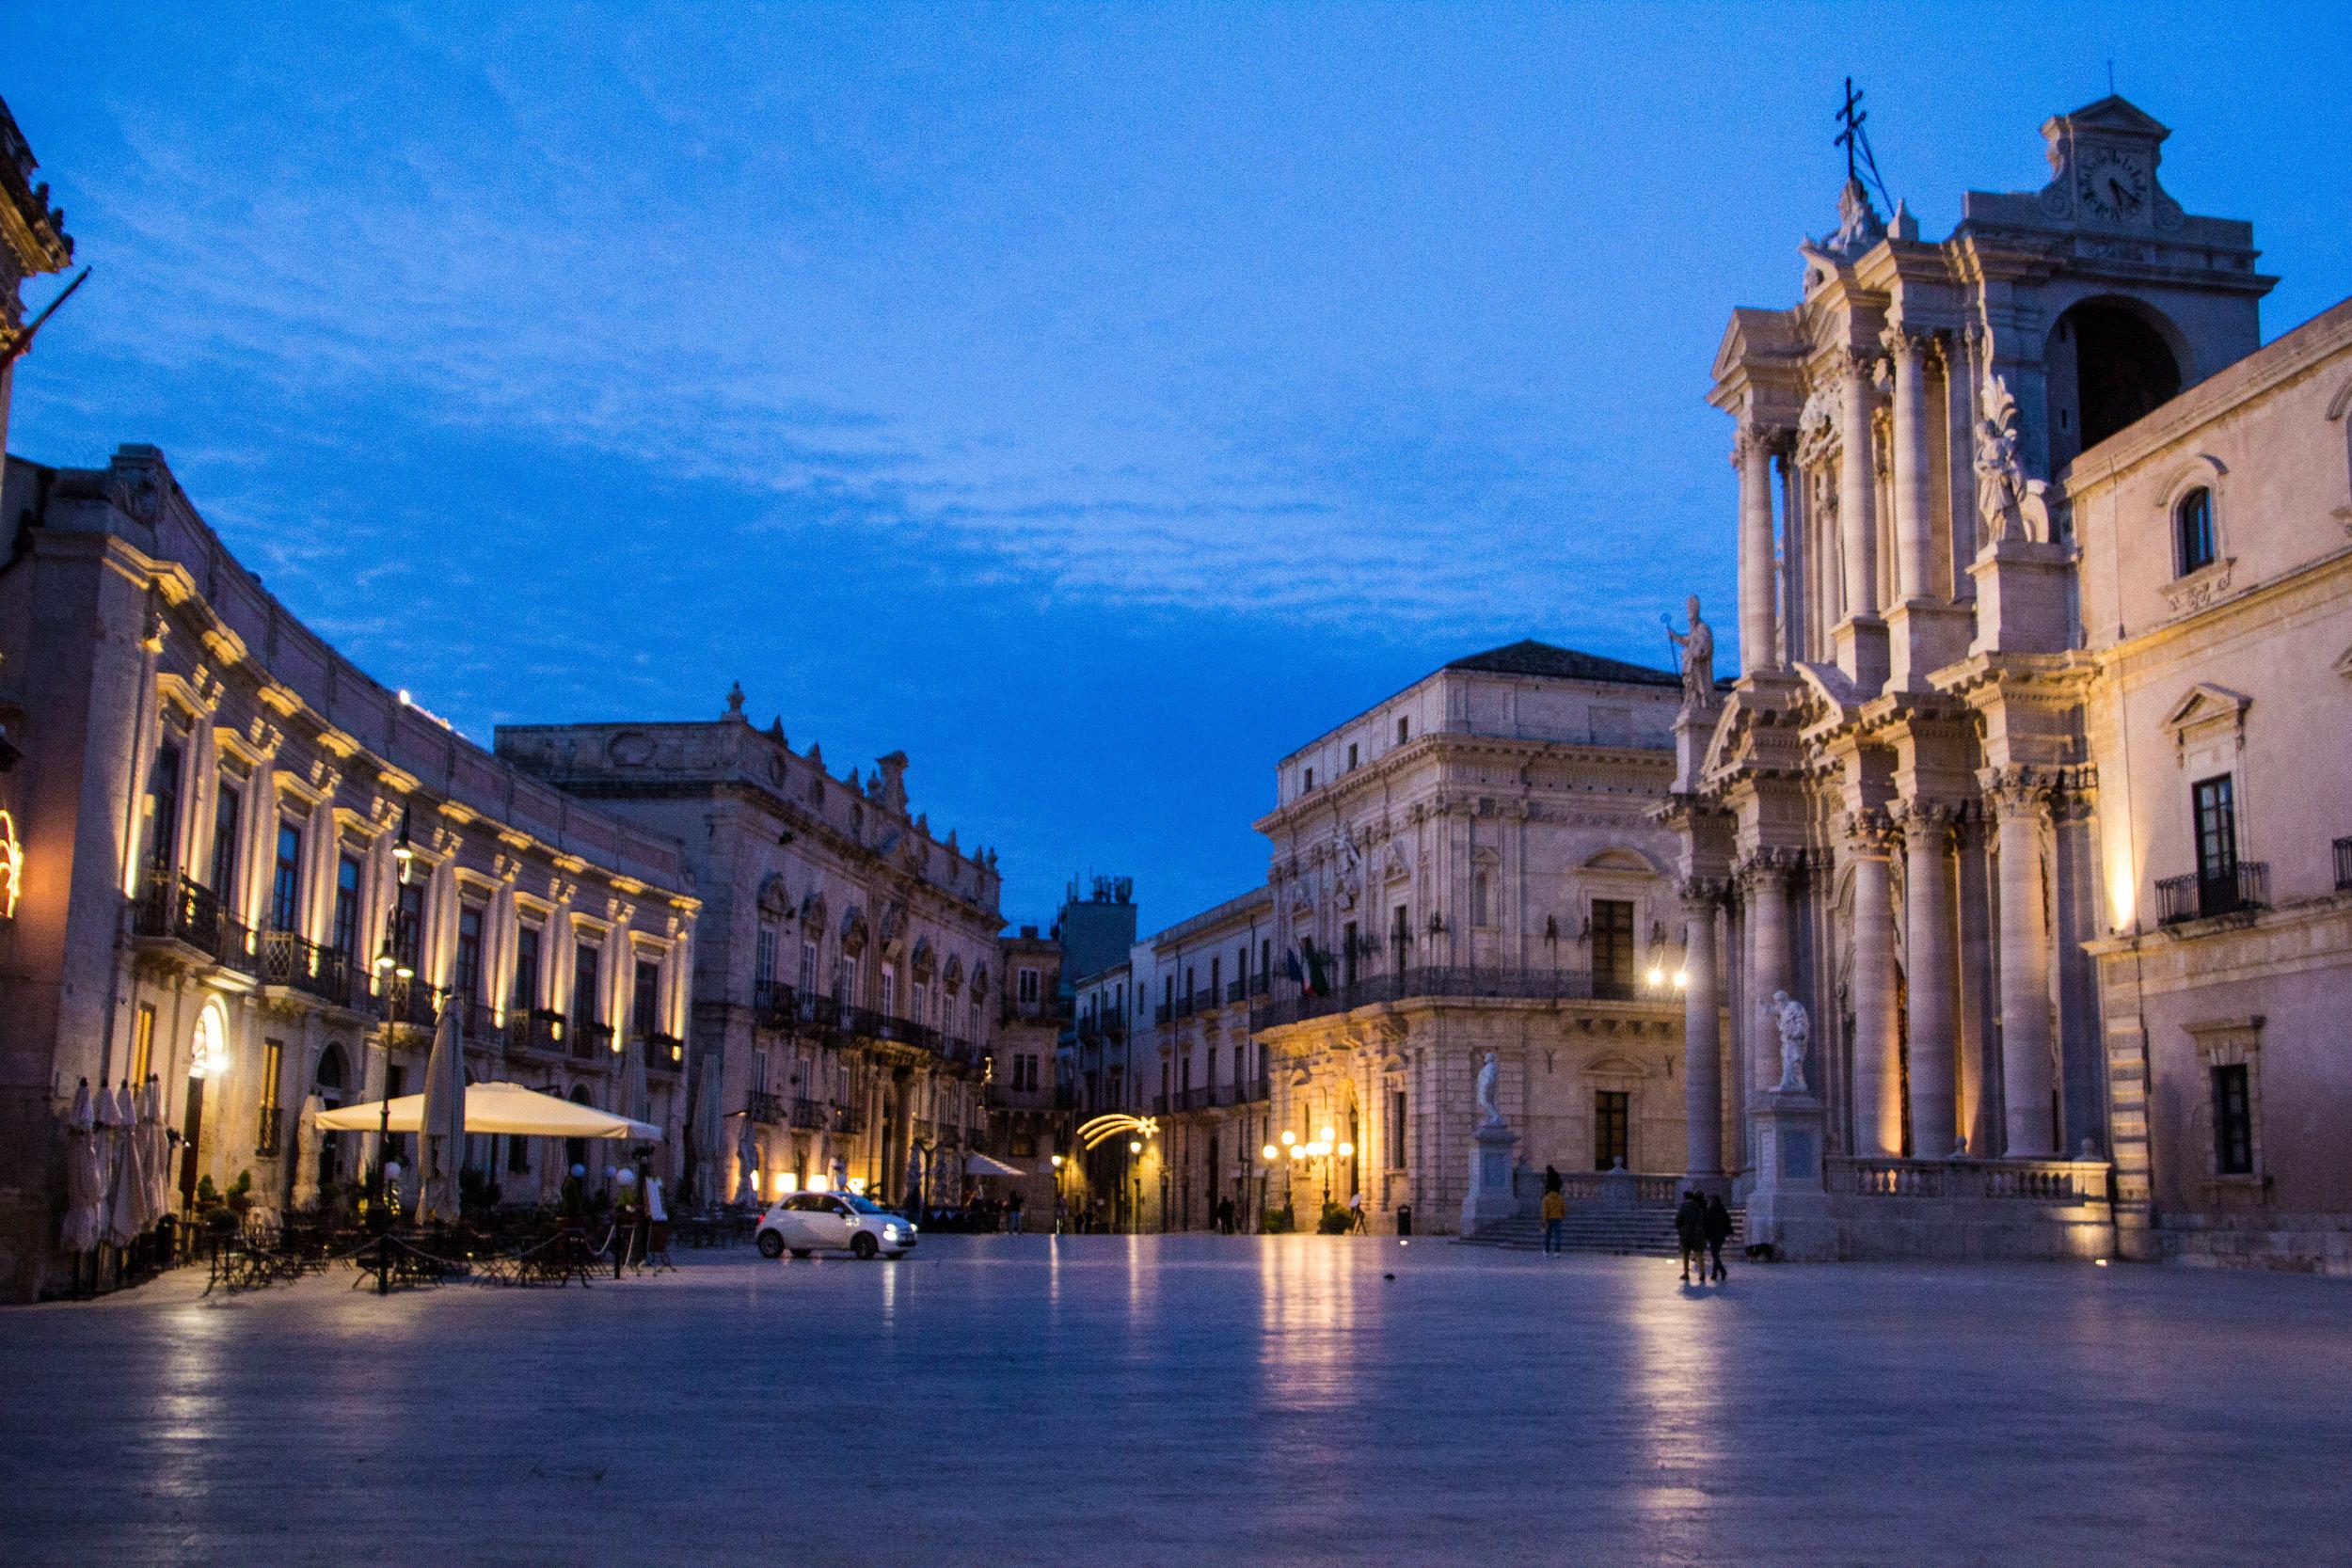 piazza-duomo-sunset-ortygia-syracuse-sicily-29.jpg